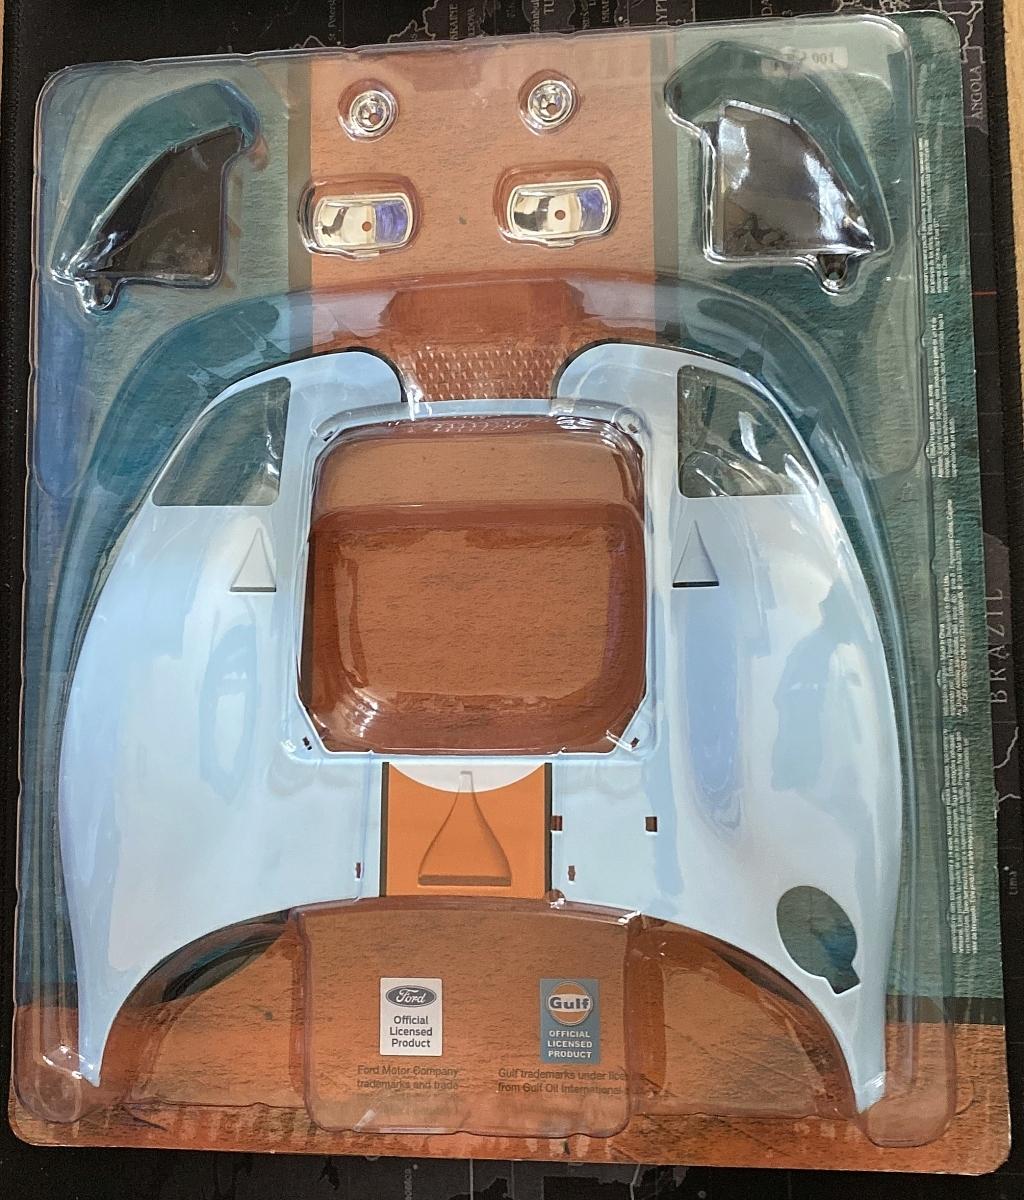 Ford GT / DeAgostini, 1:8 Gt0110